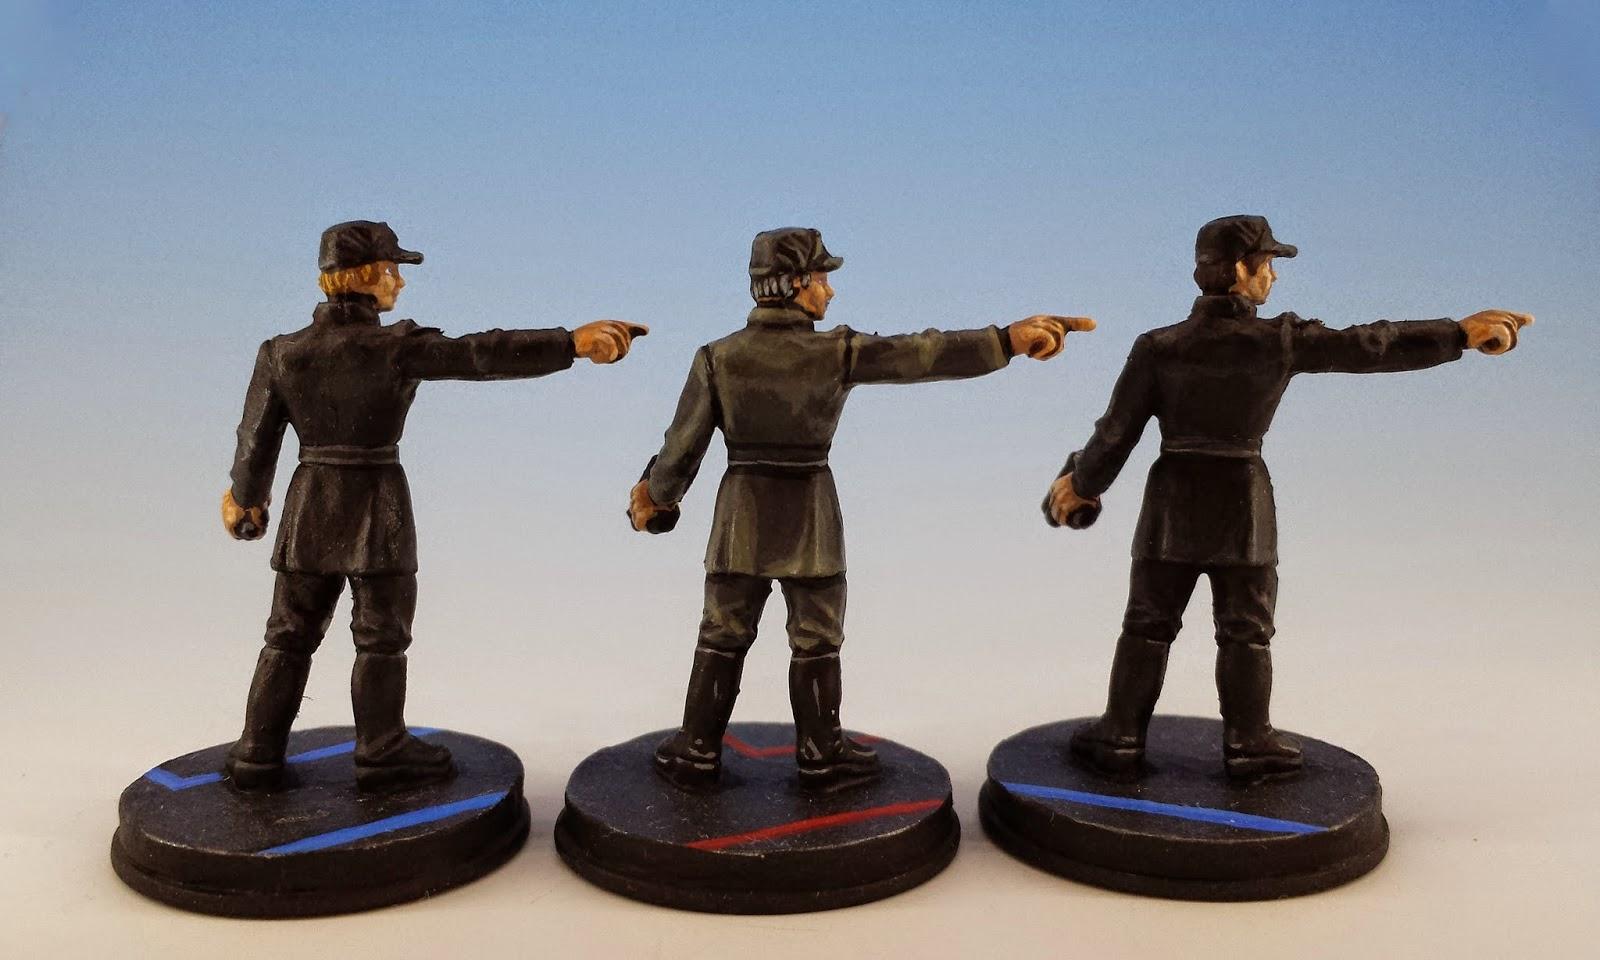 Star_Wars_Miniatures_Imperial_Officers_Oldenhammer_003.jpg